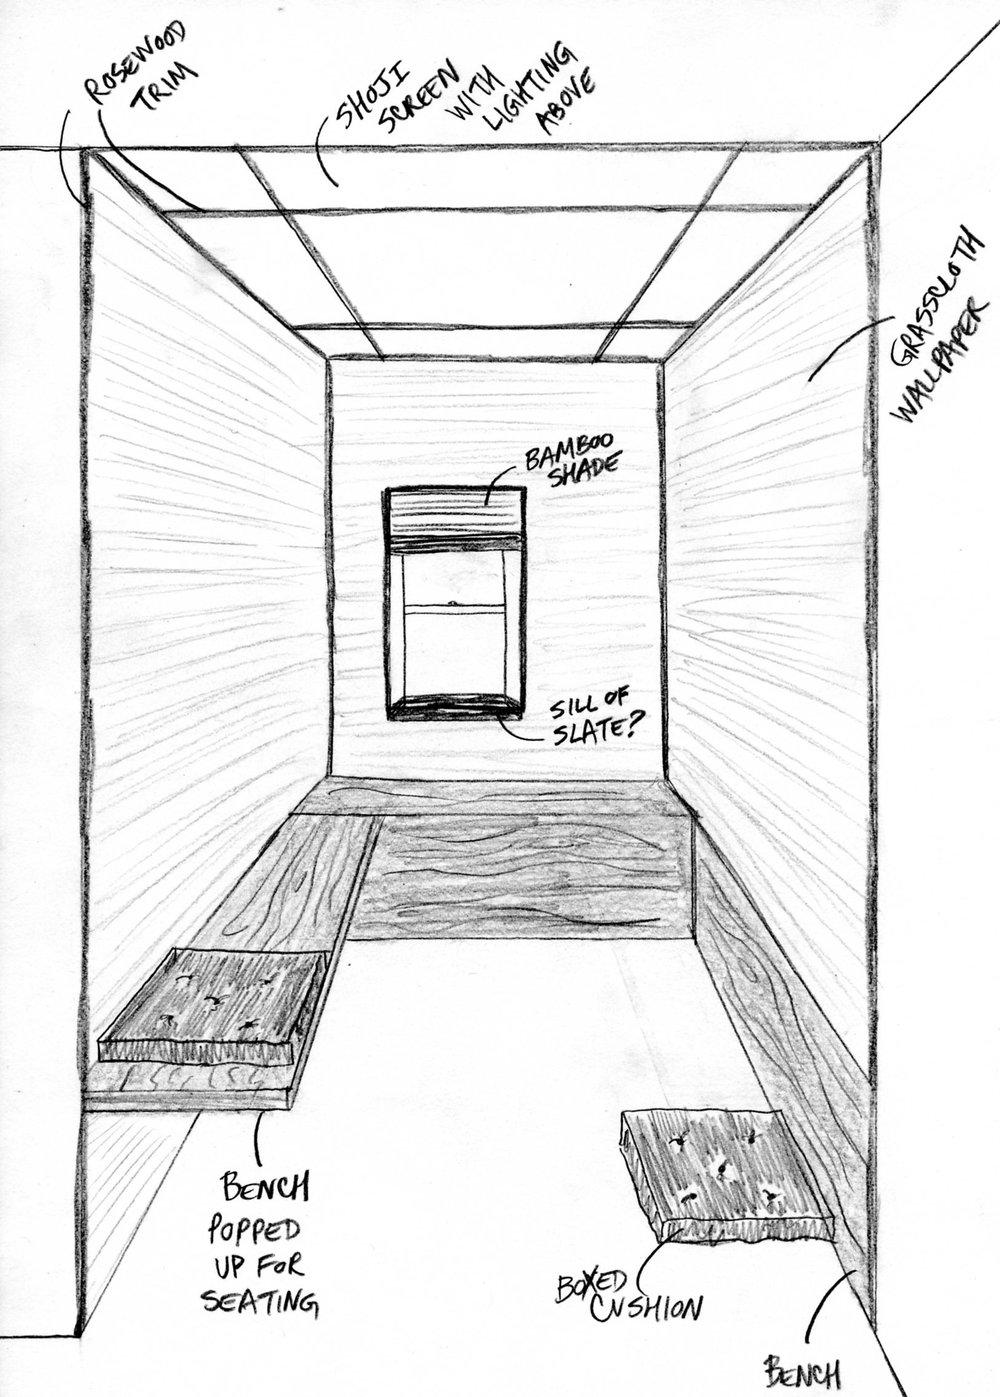 Lynch Dining Concept 6.25.10.jpg